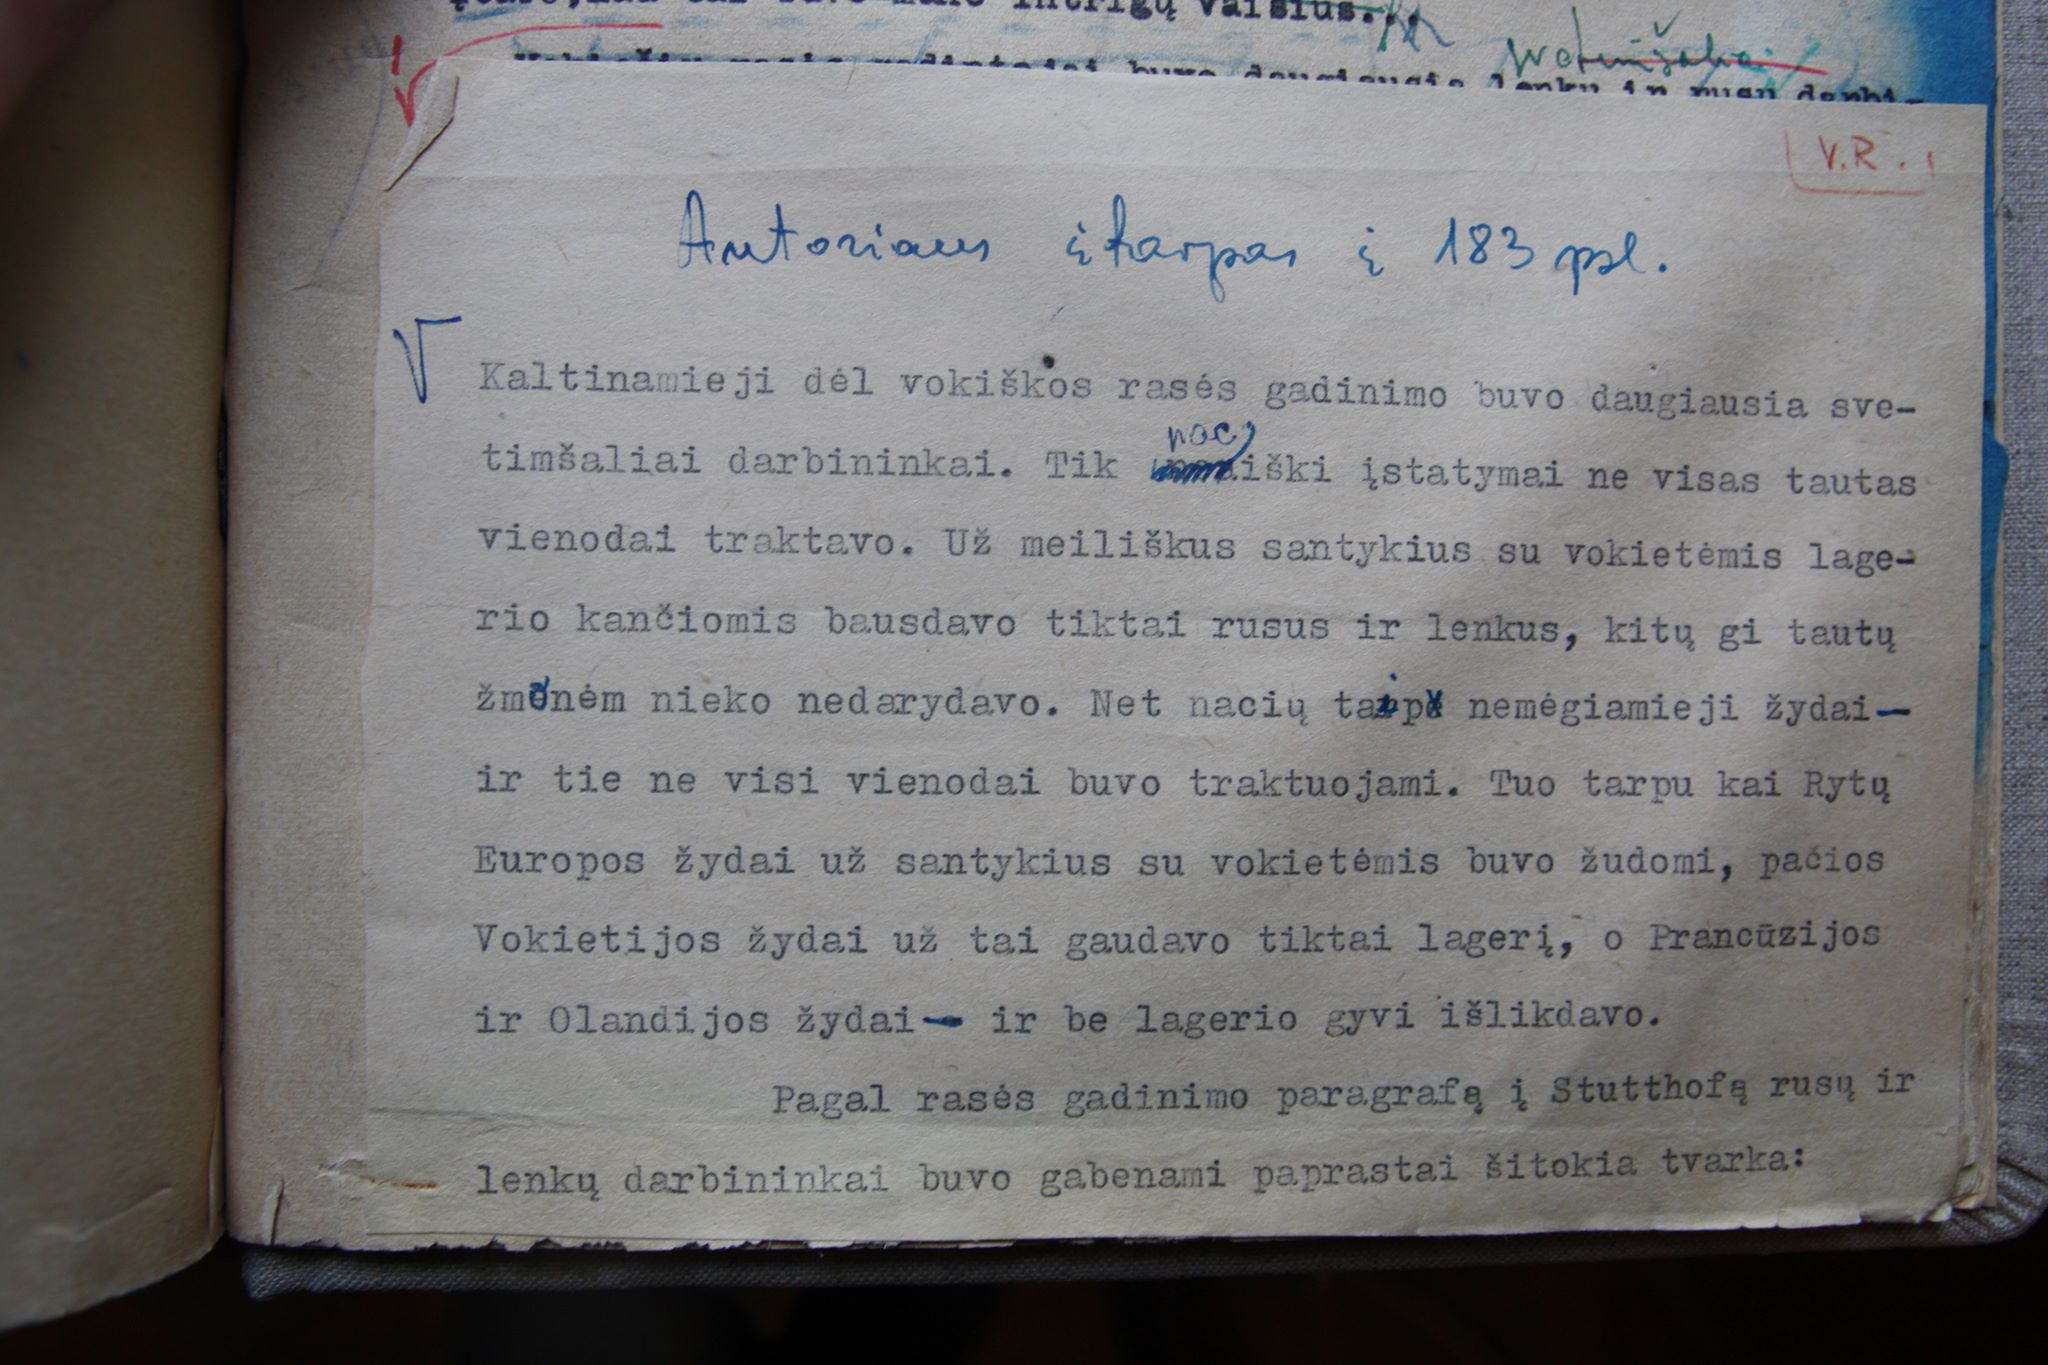 D.Pocevicius, FB-04